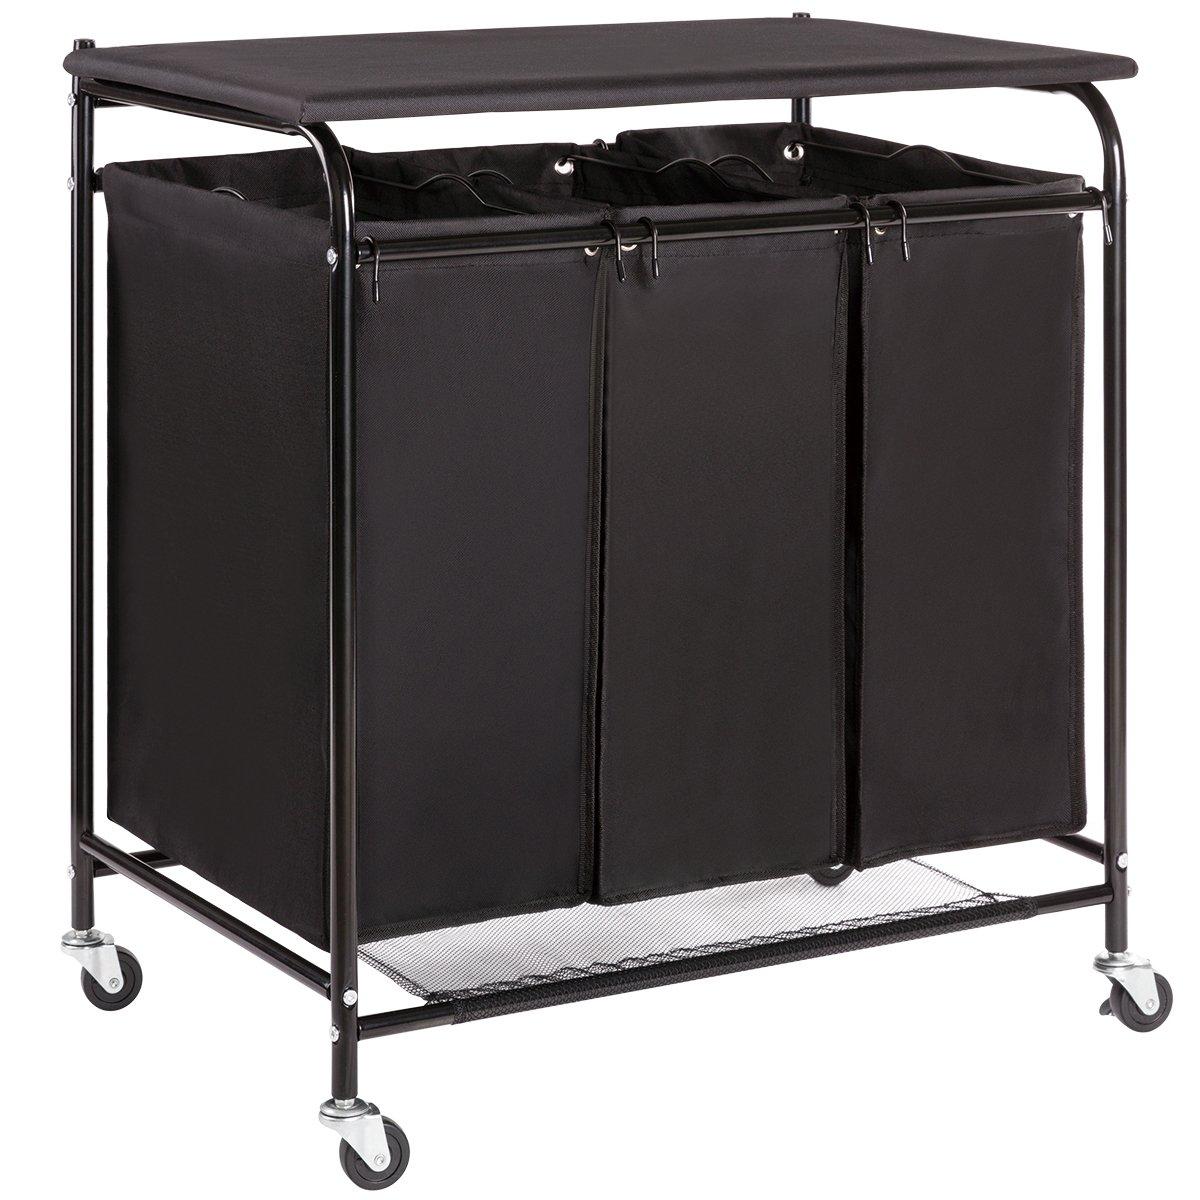 3 bag heavy duty rolling laundry sorter cart hamper organizer with ironing board 6951390933963. Black Bedroom Furniture Sets. Home Design Ideas